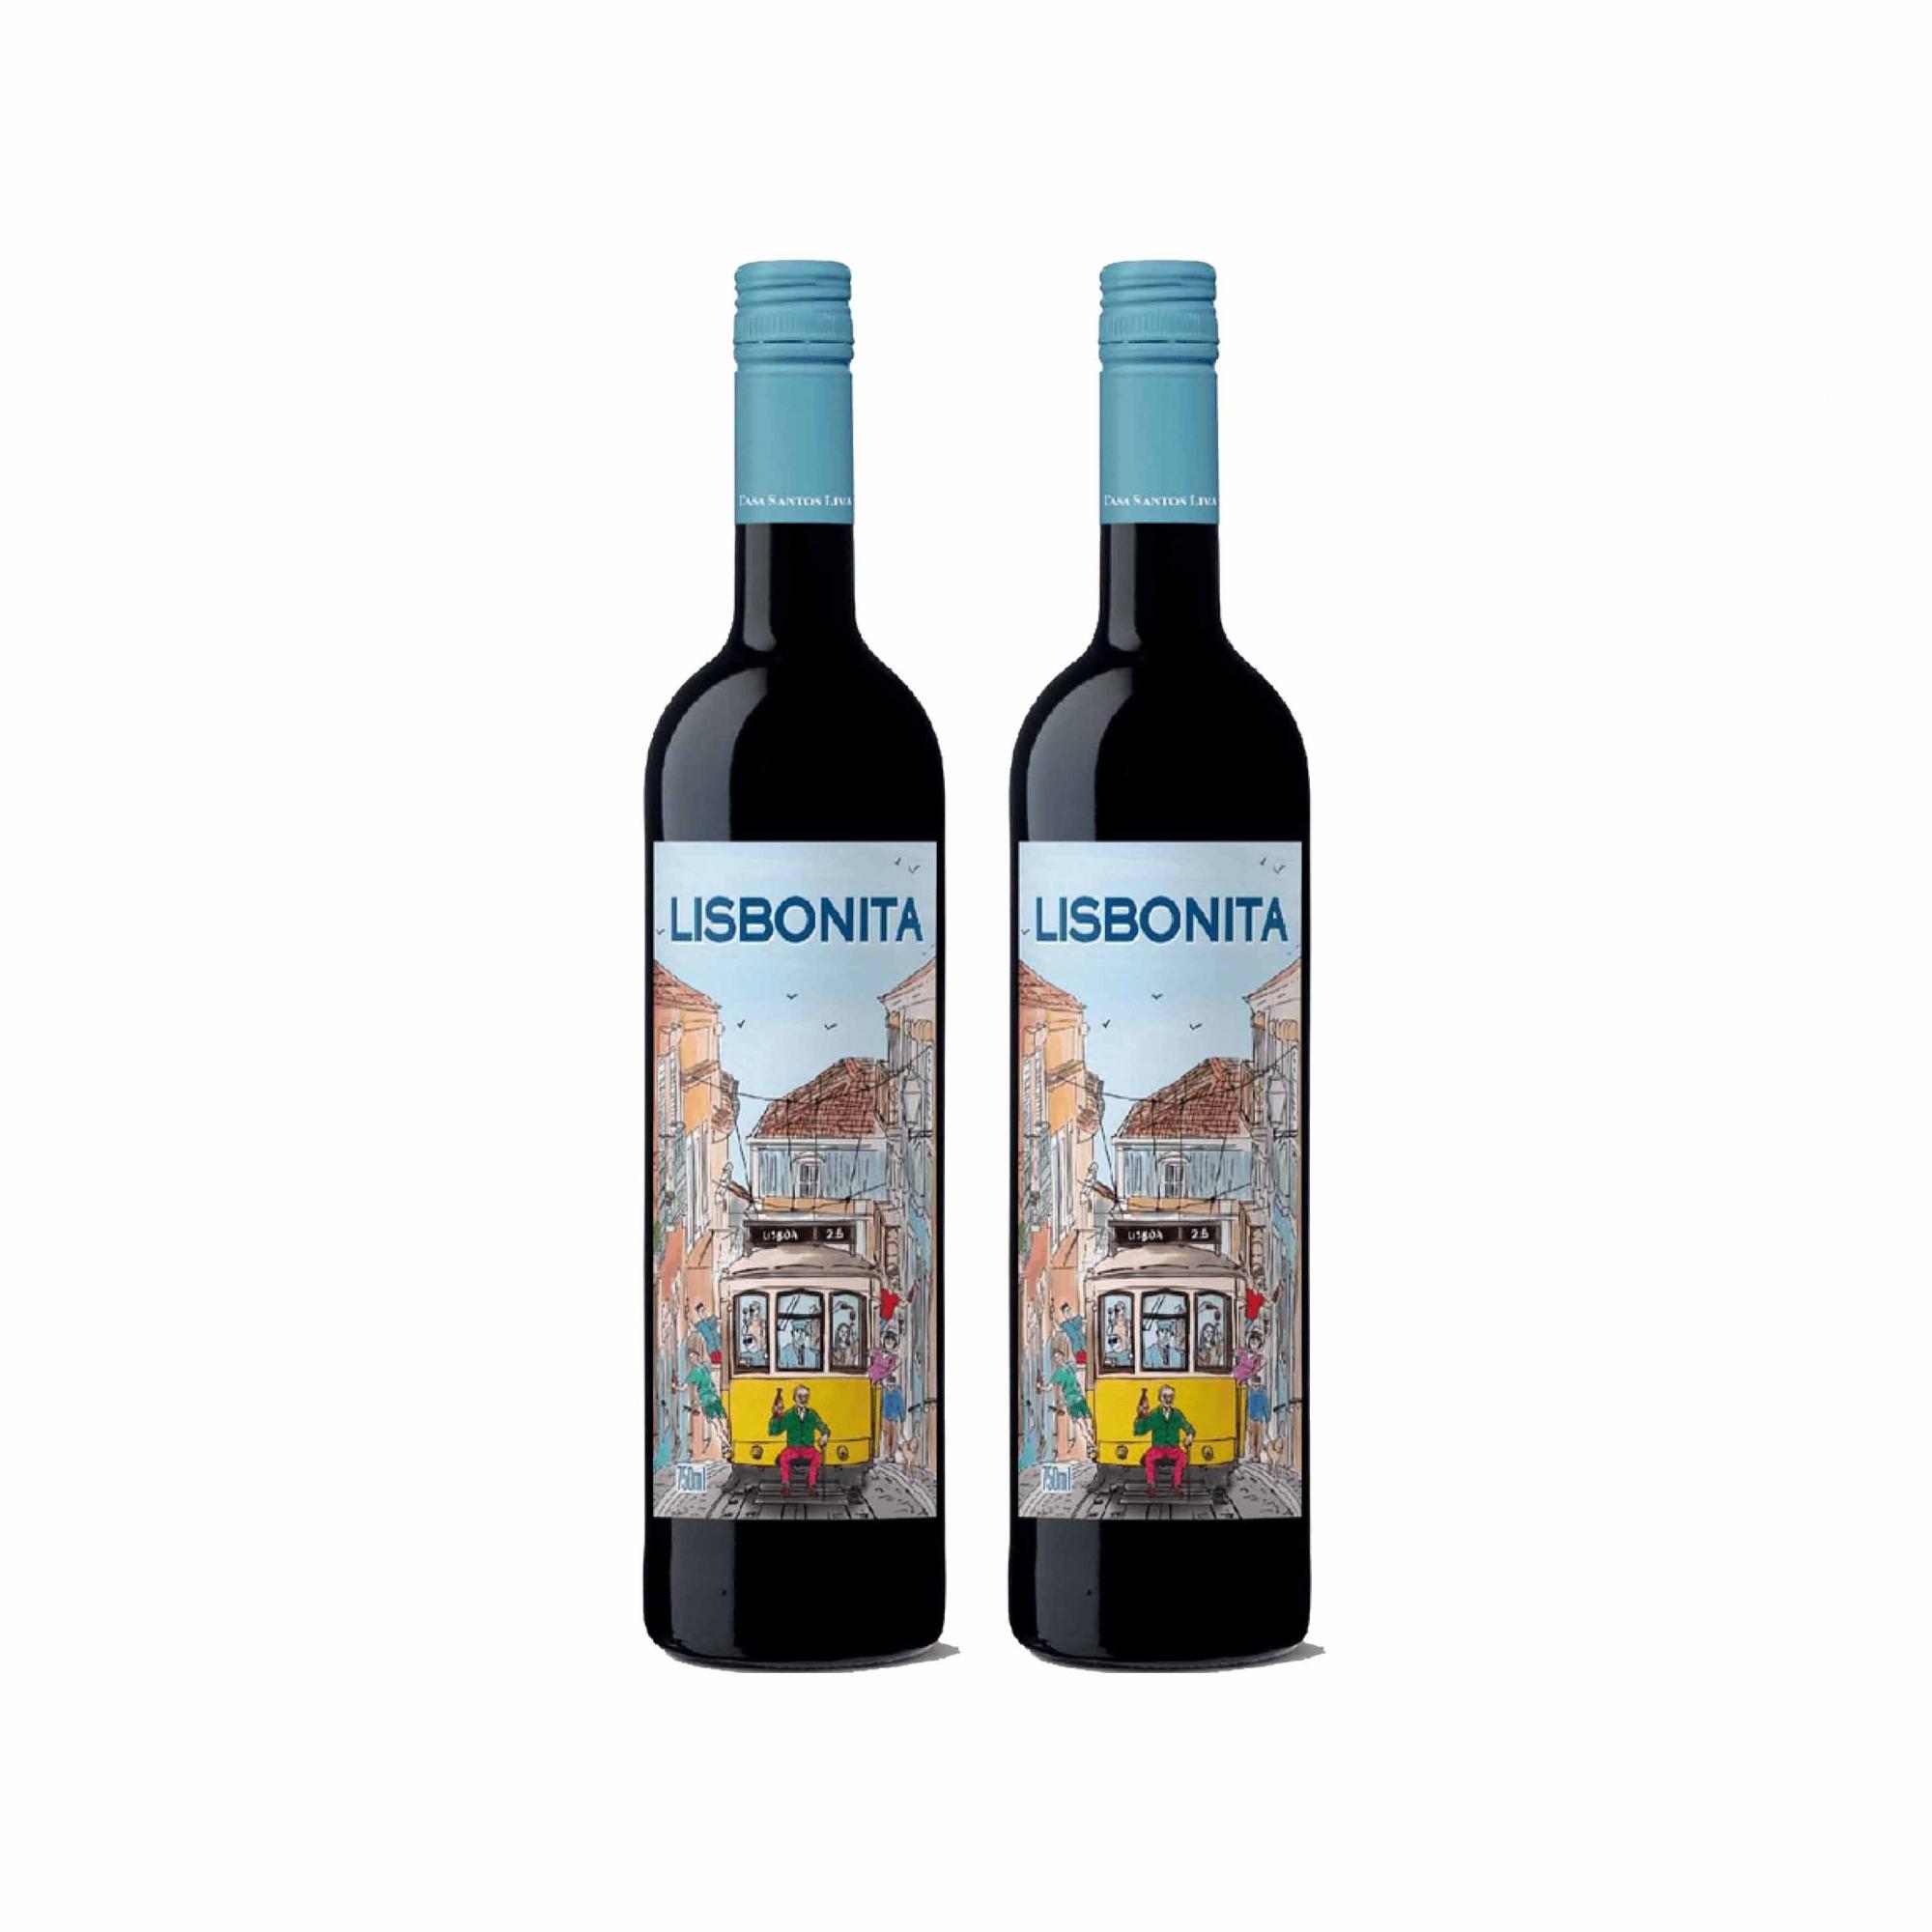 Kit 2x Vinho Tinto Português Casa Santos Lima Lisbonita 2018